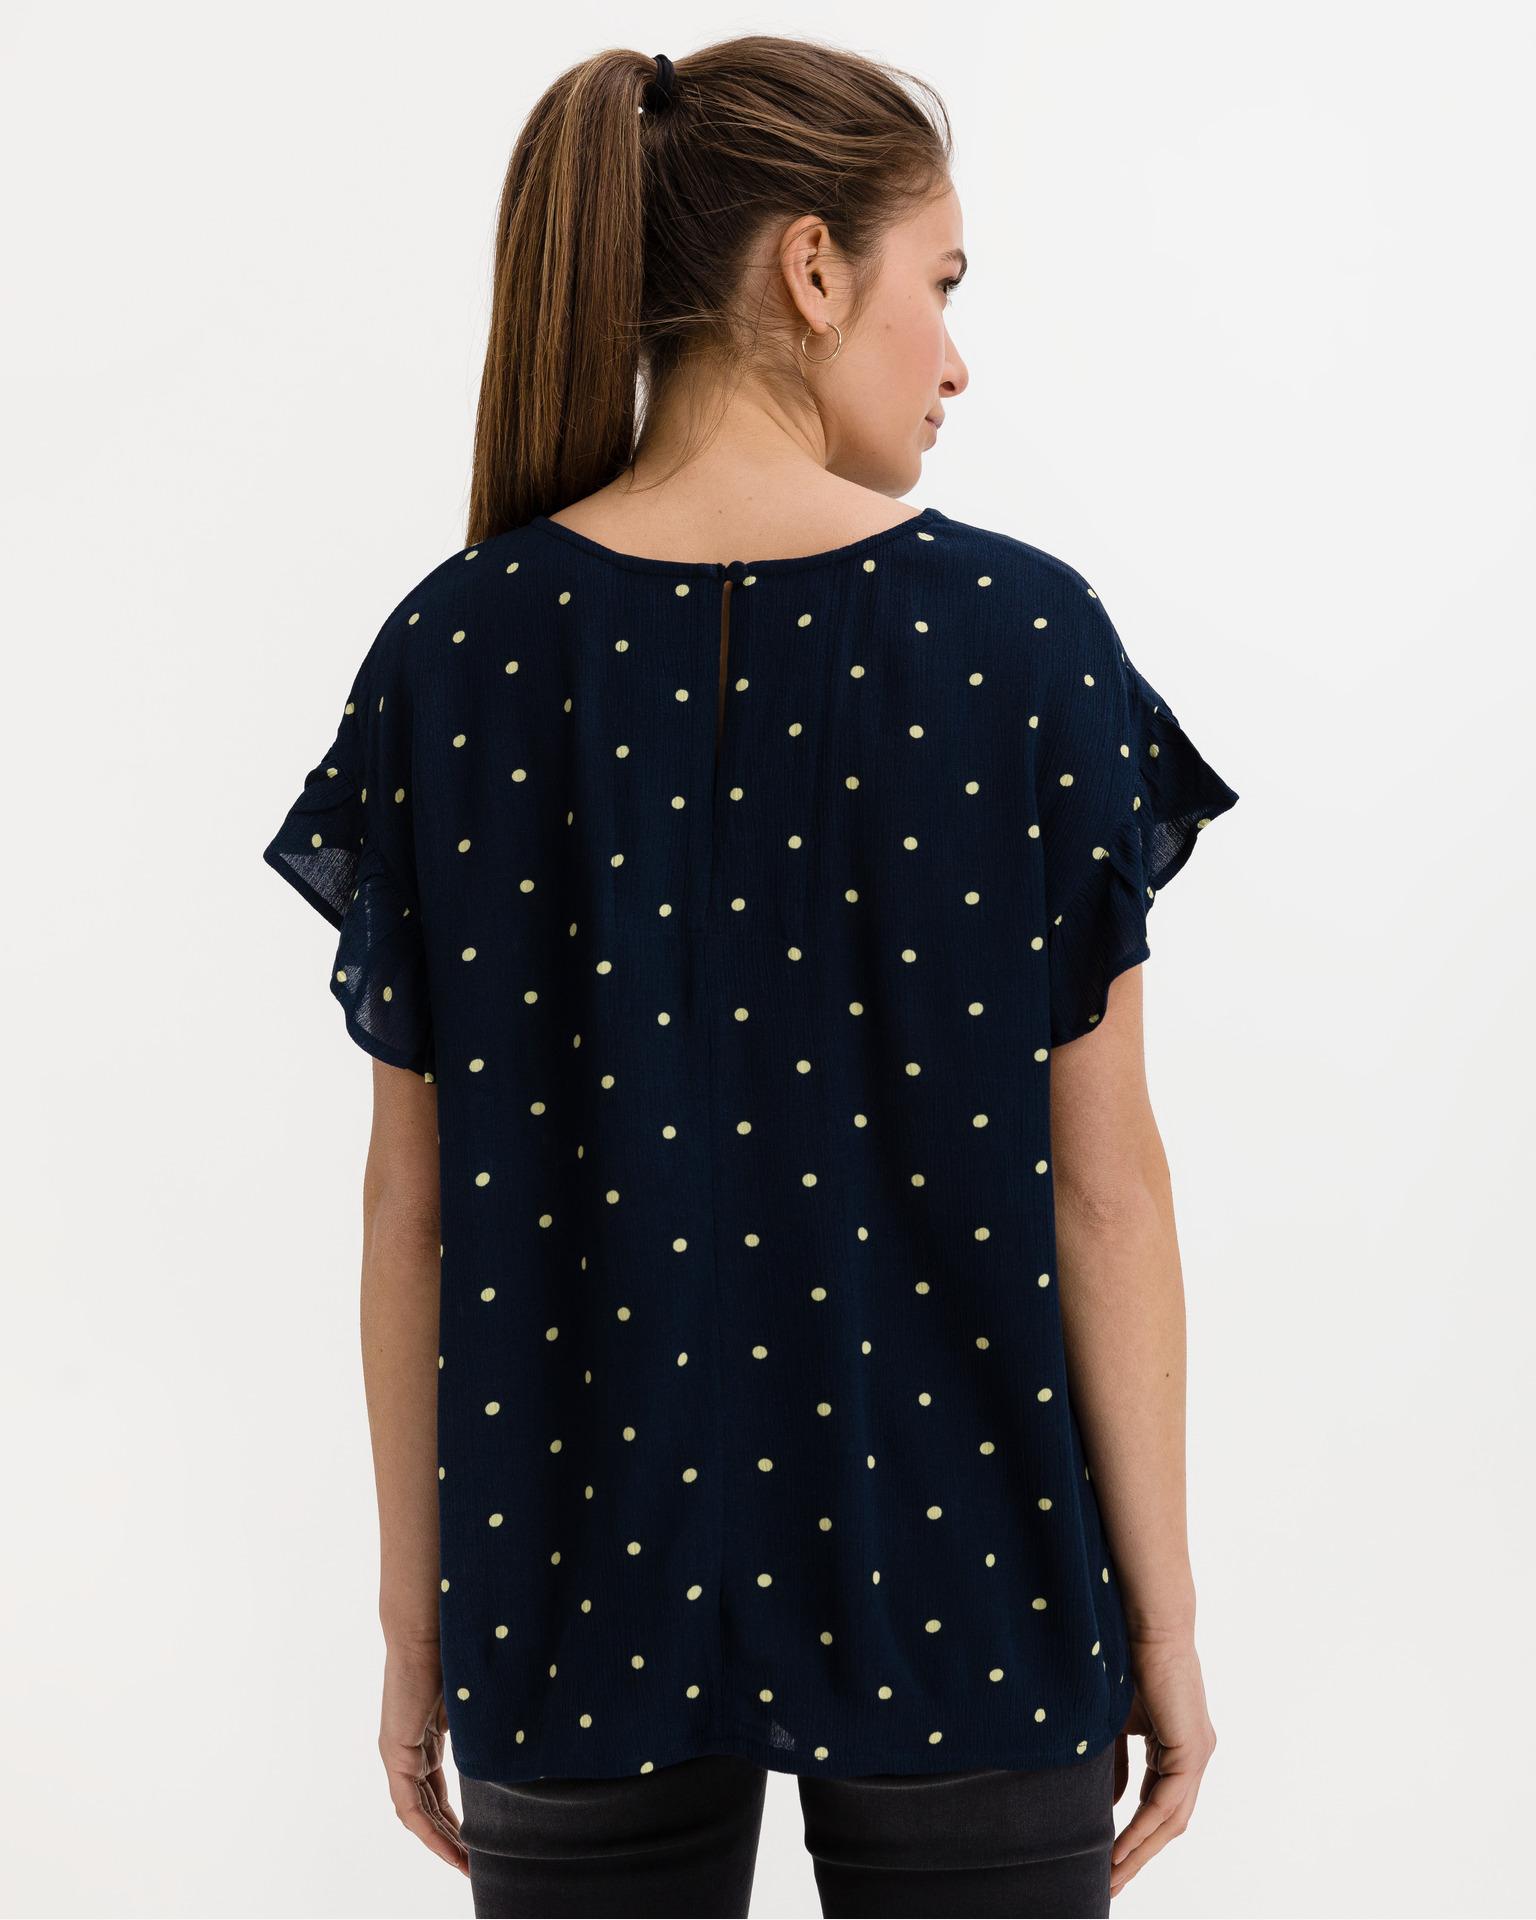 Ichi niebieski bluzka Marrakech